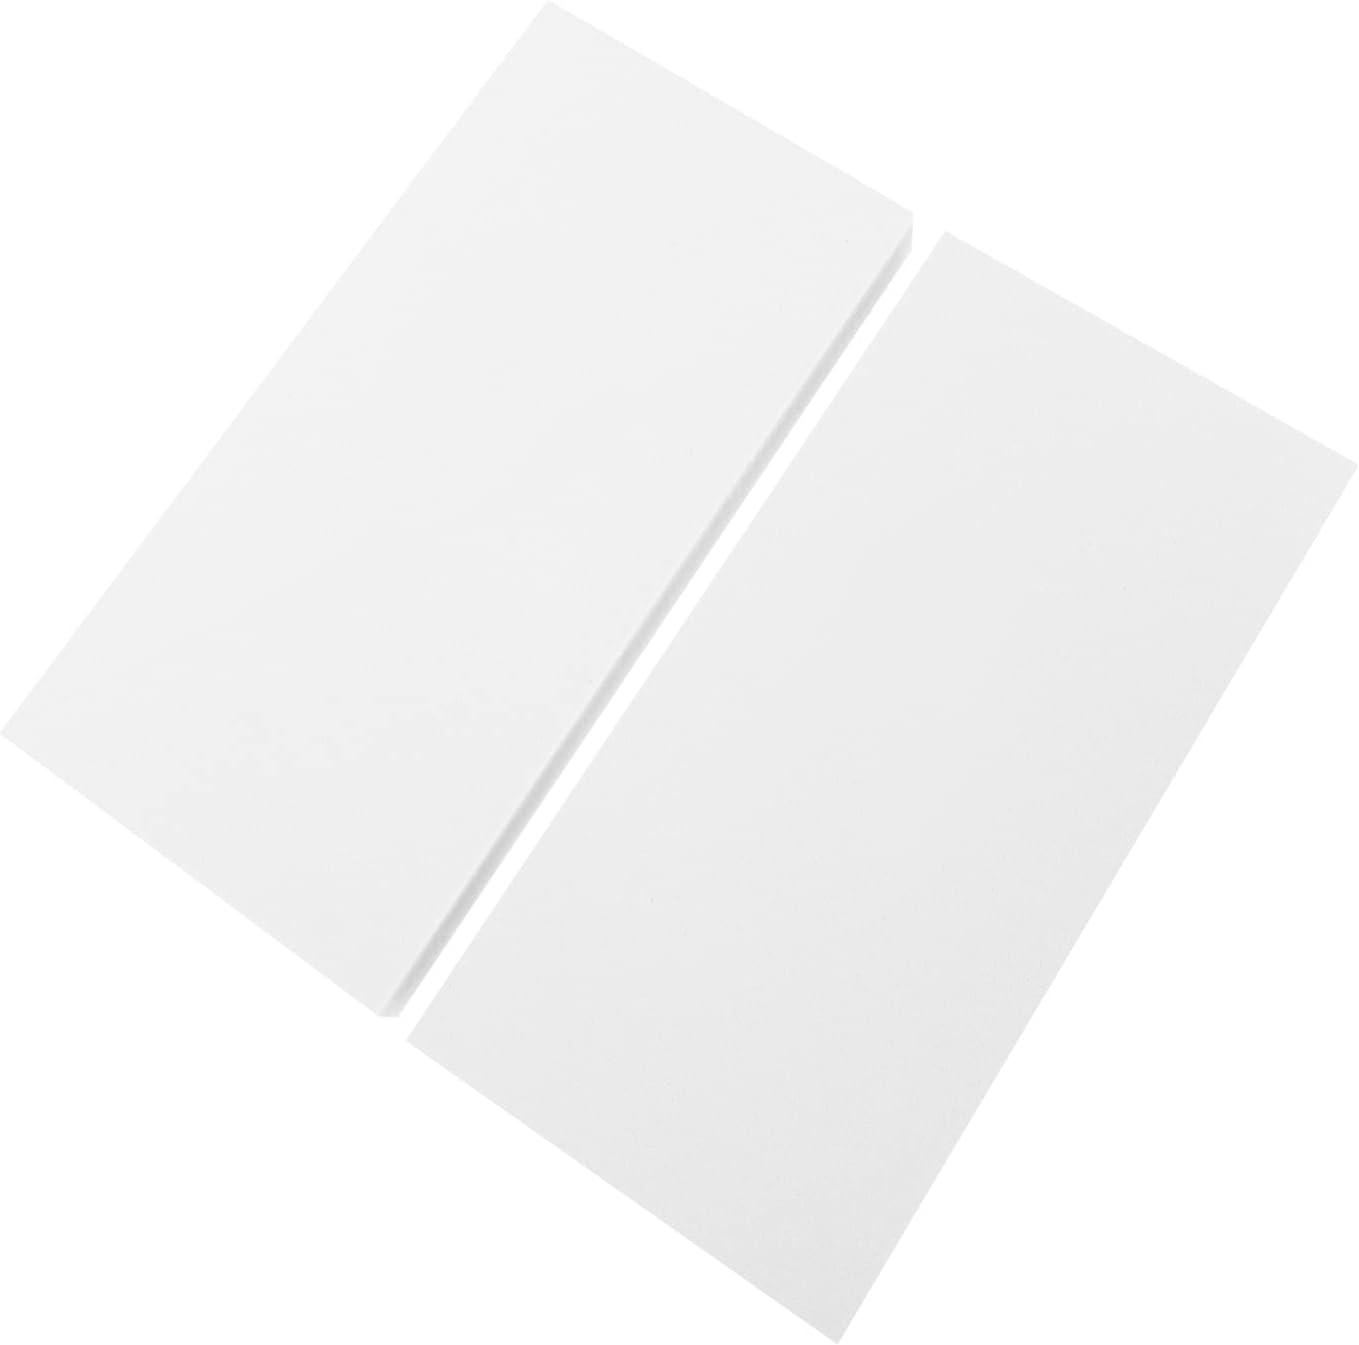 Scicalife 2pcs EVA Foam New sales Sheets Polystyrene Milwaukee Mall Craft Squa Block